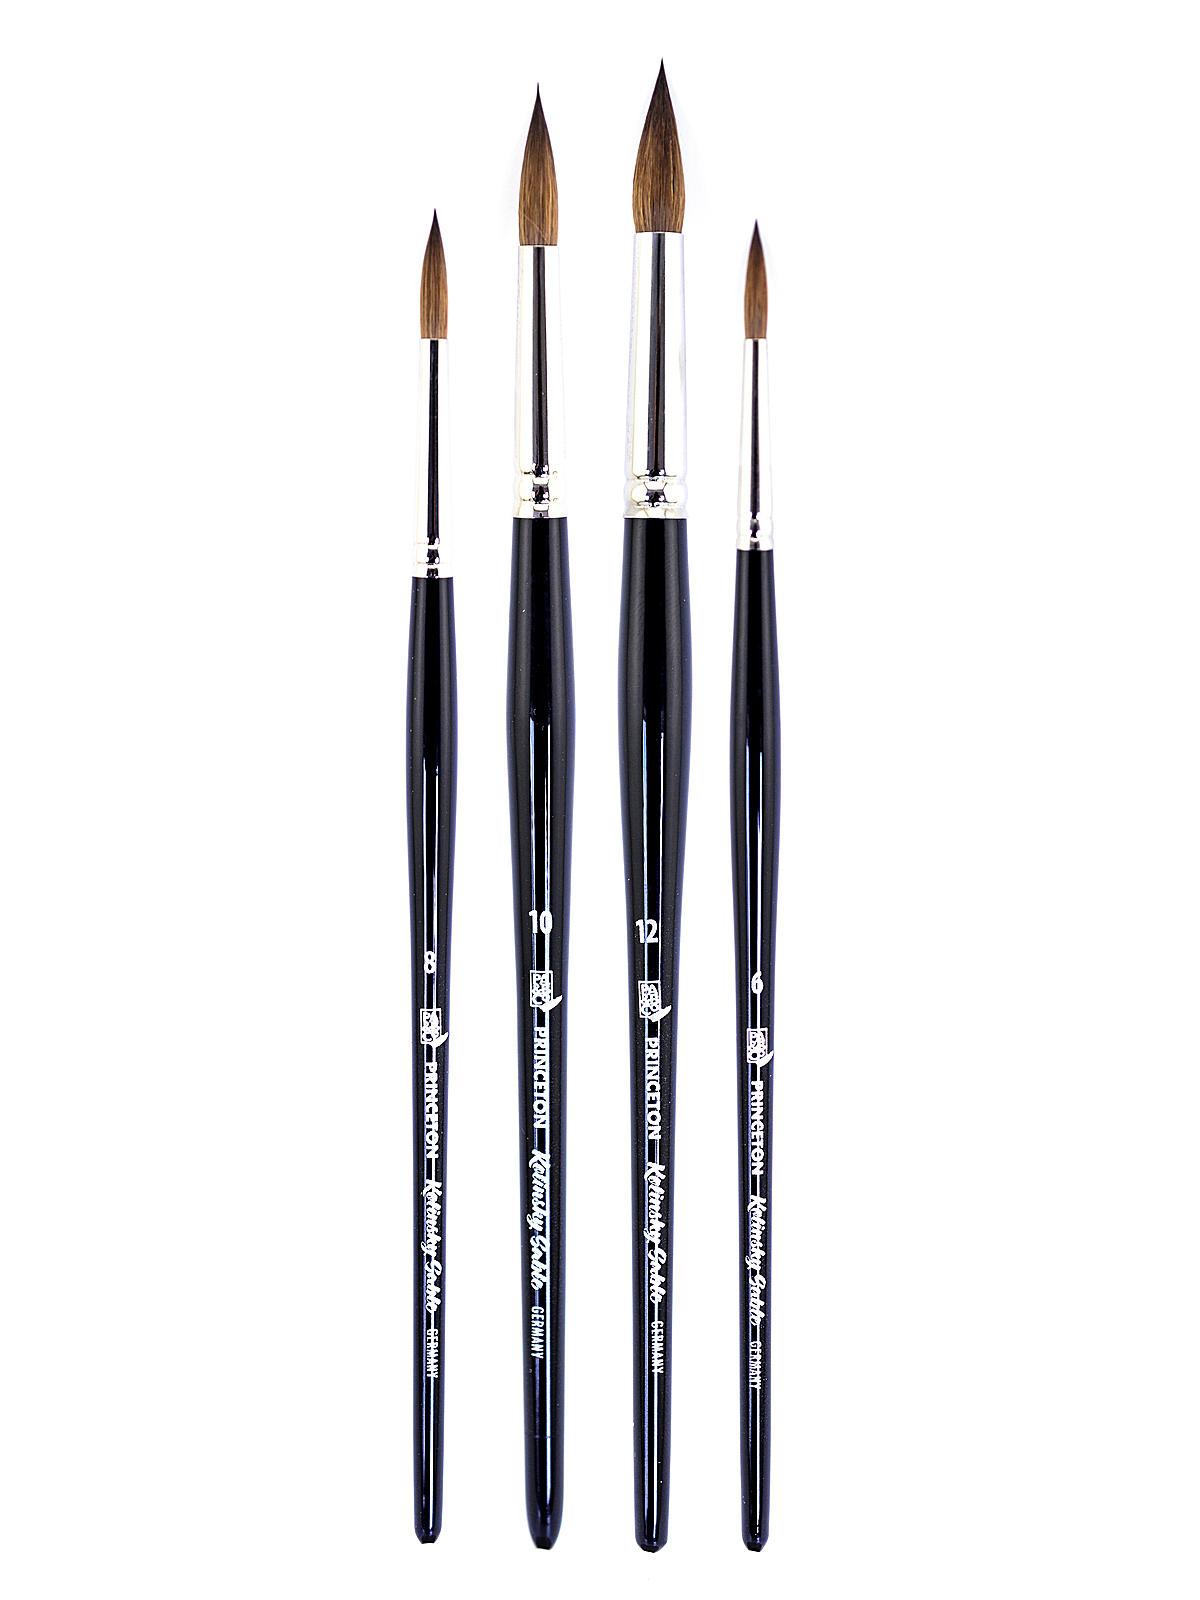 Series 7050 Short Handled Kolinsky Sable Brushes